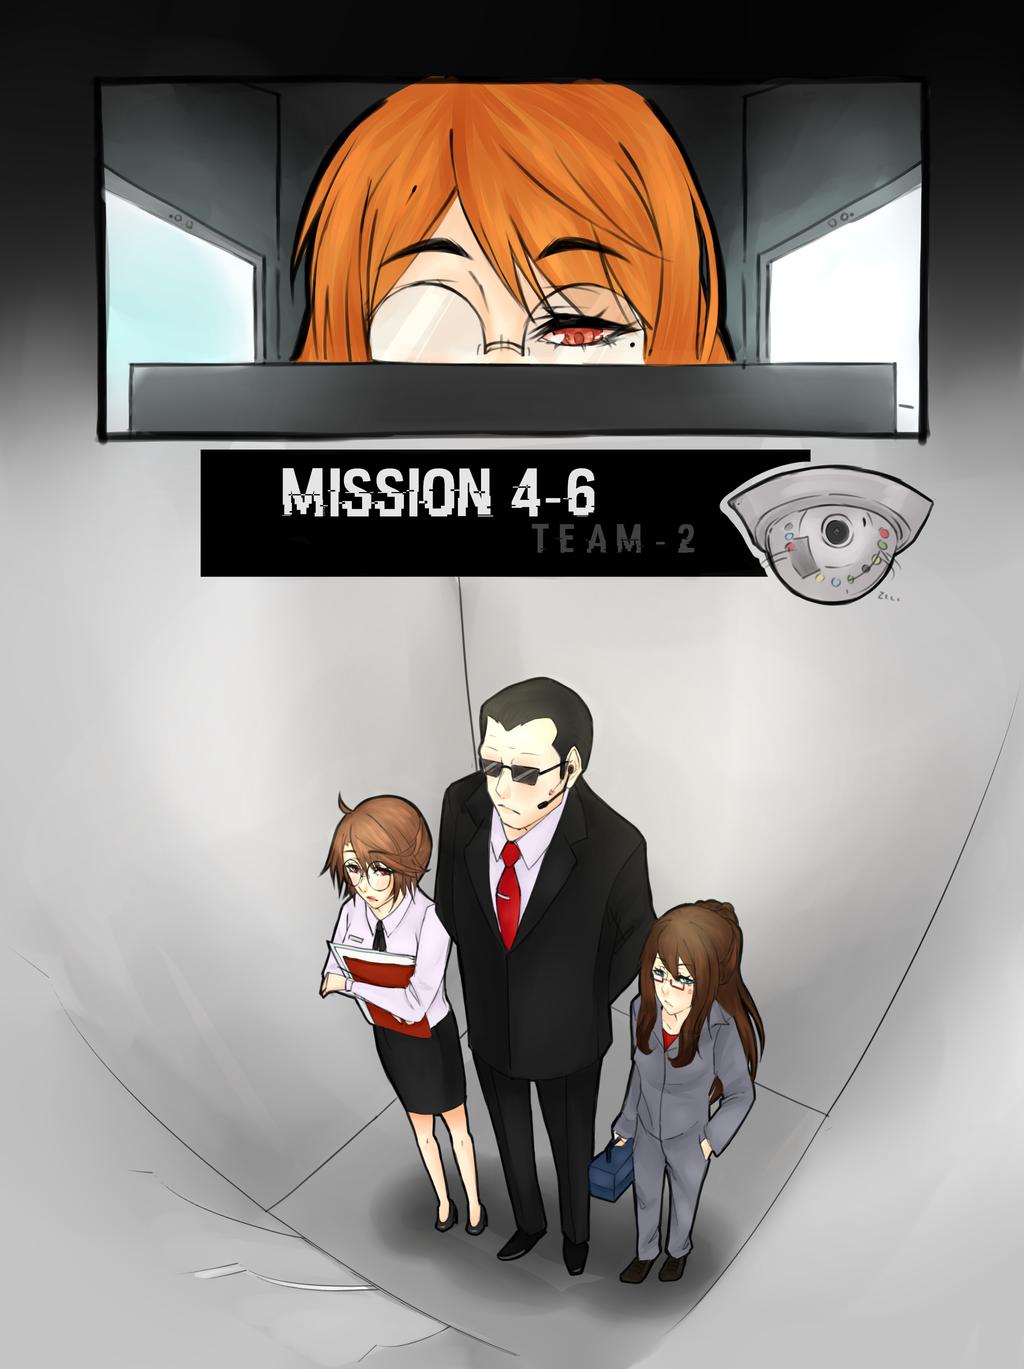 [DPR] Mission 4-6 - Team 2 { Collab avec Ruri } by FraizySmoothie